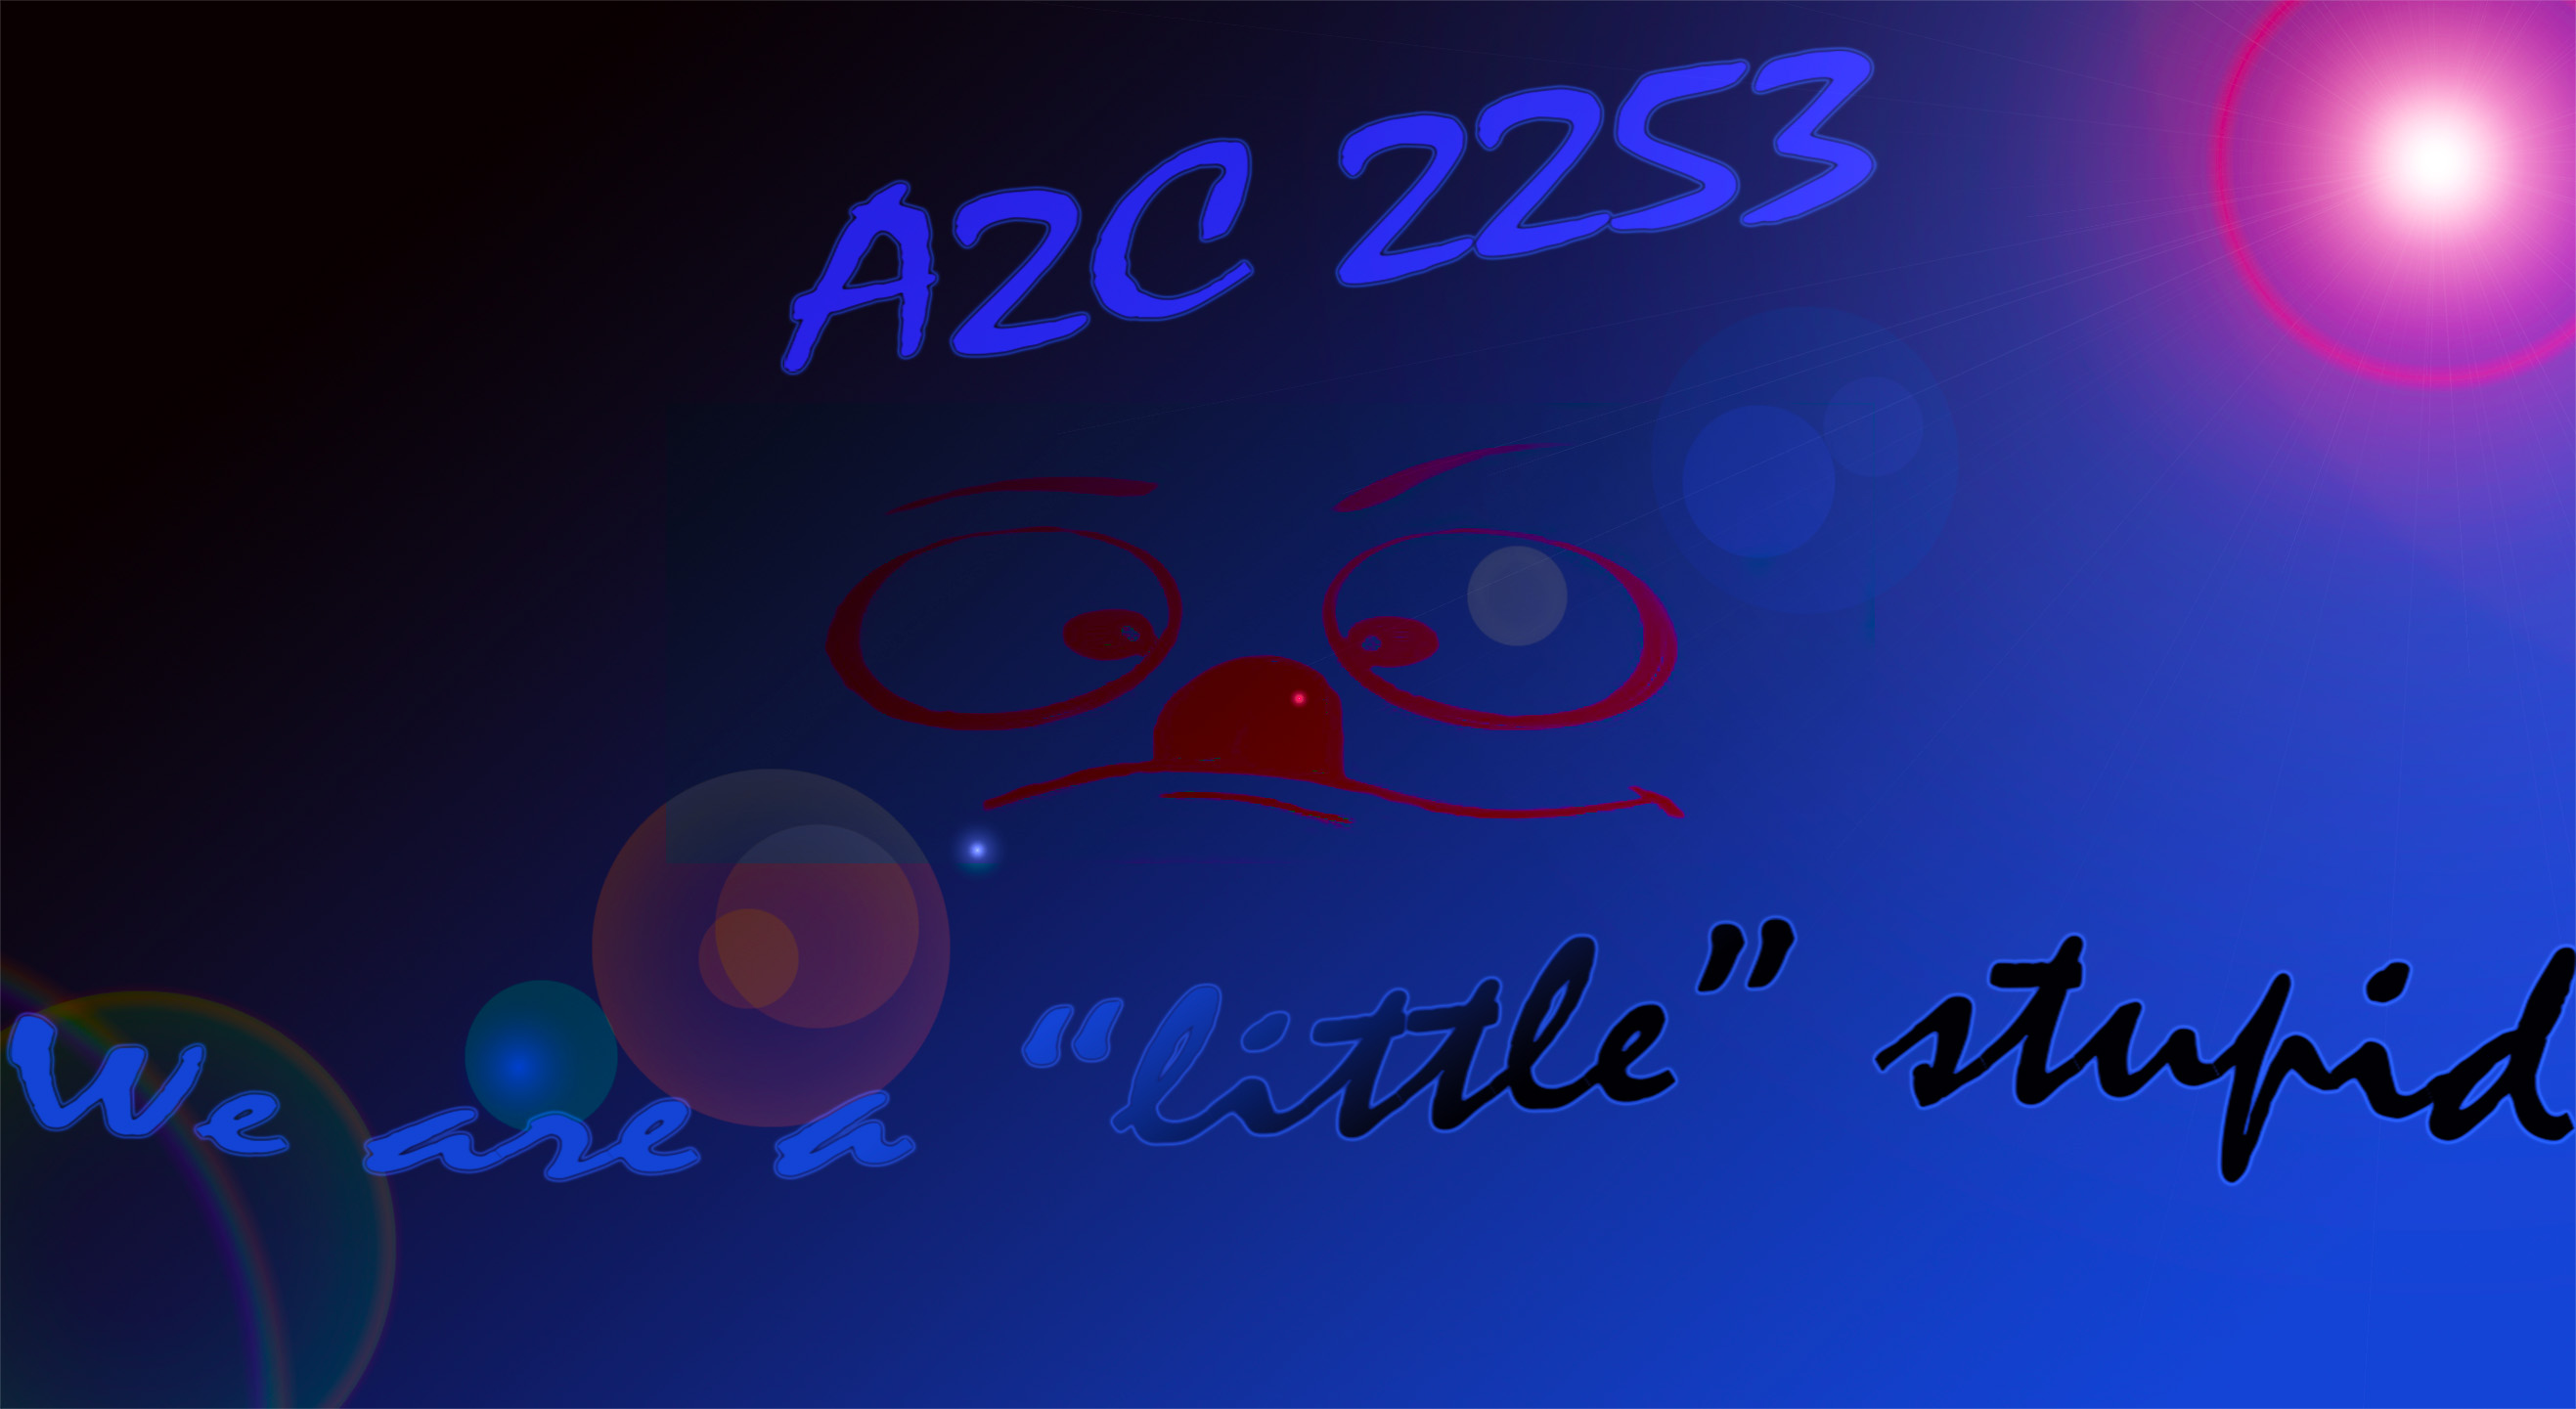 A2C Random talk